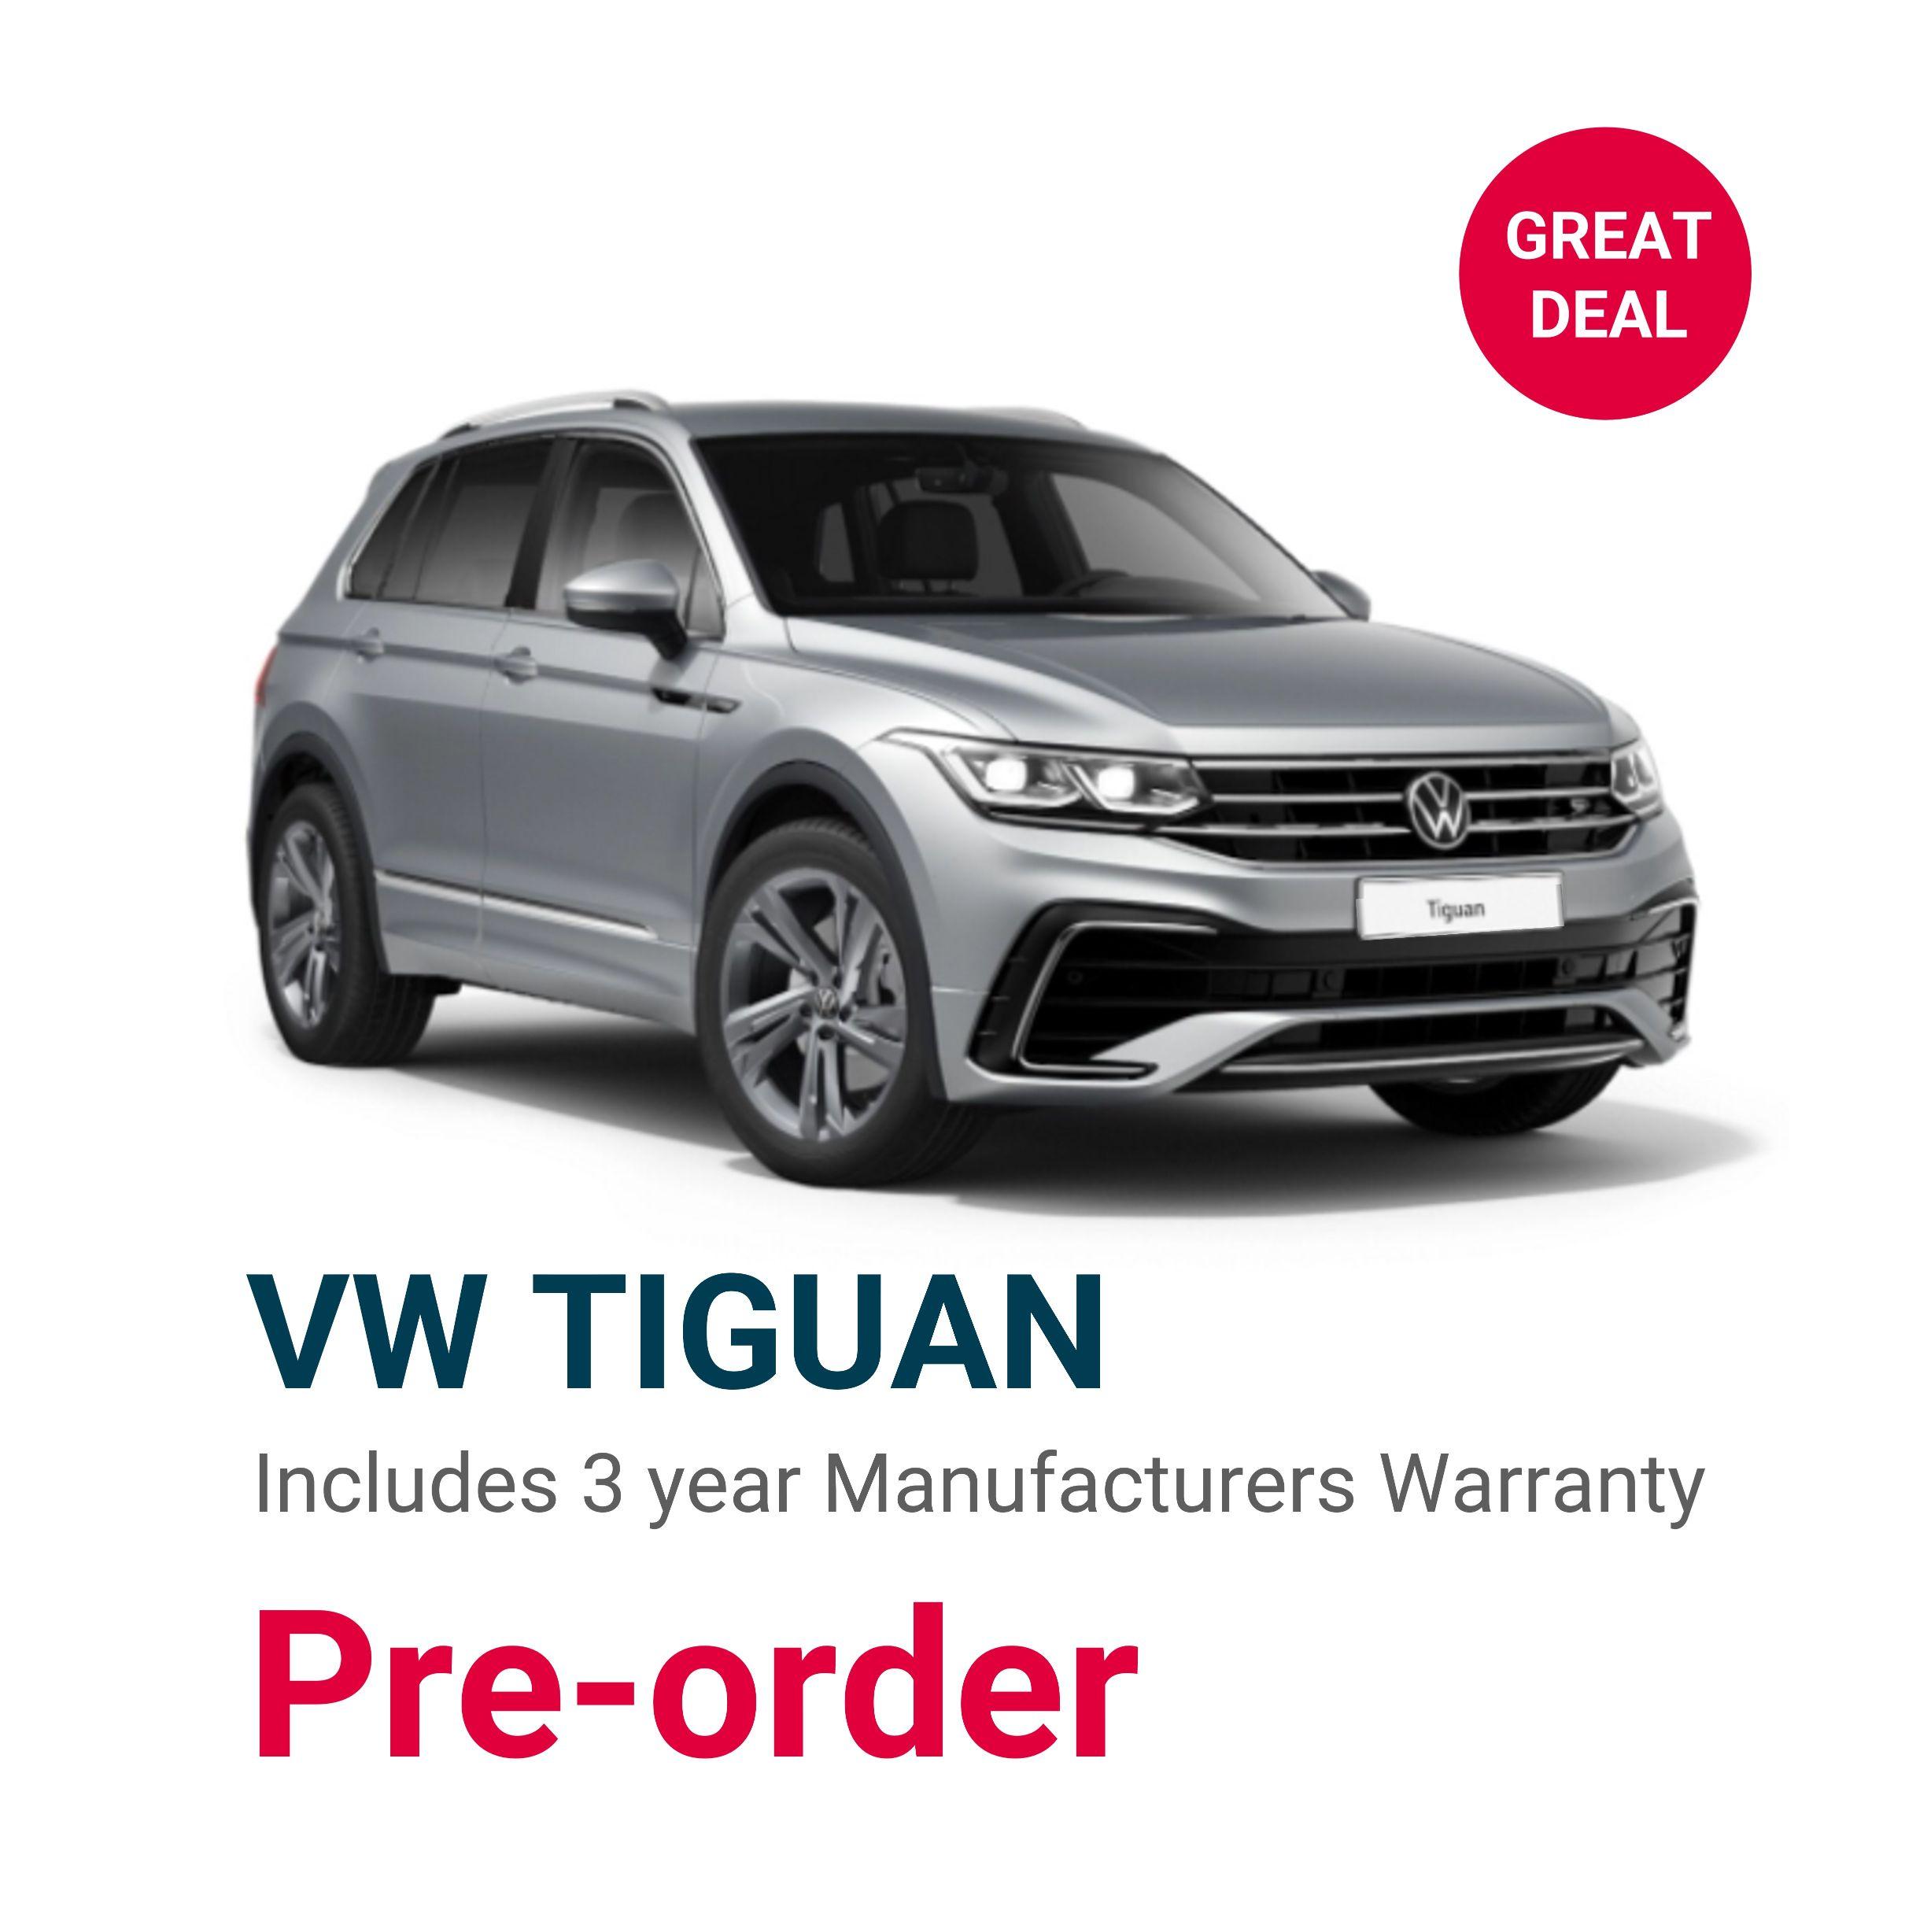 vw-tiguan-pre-order